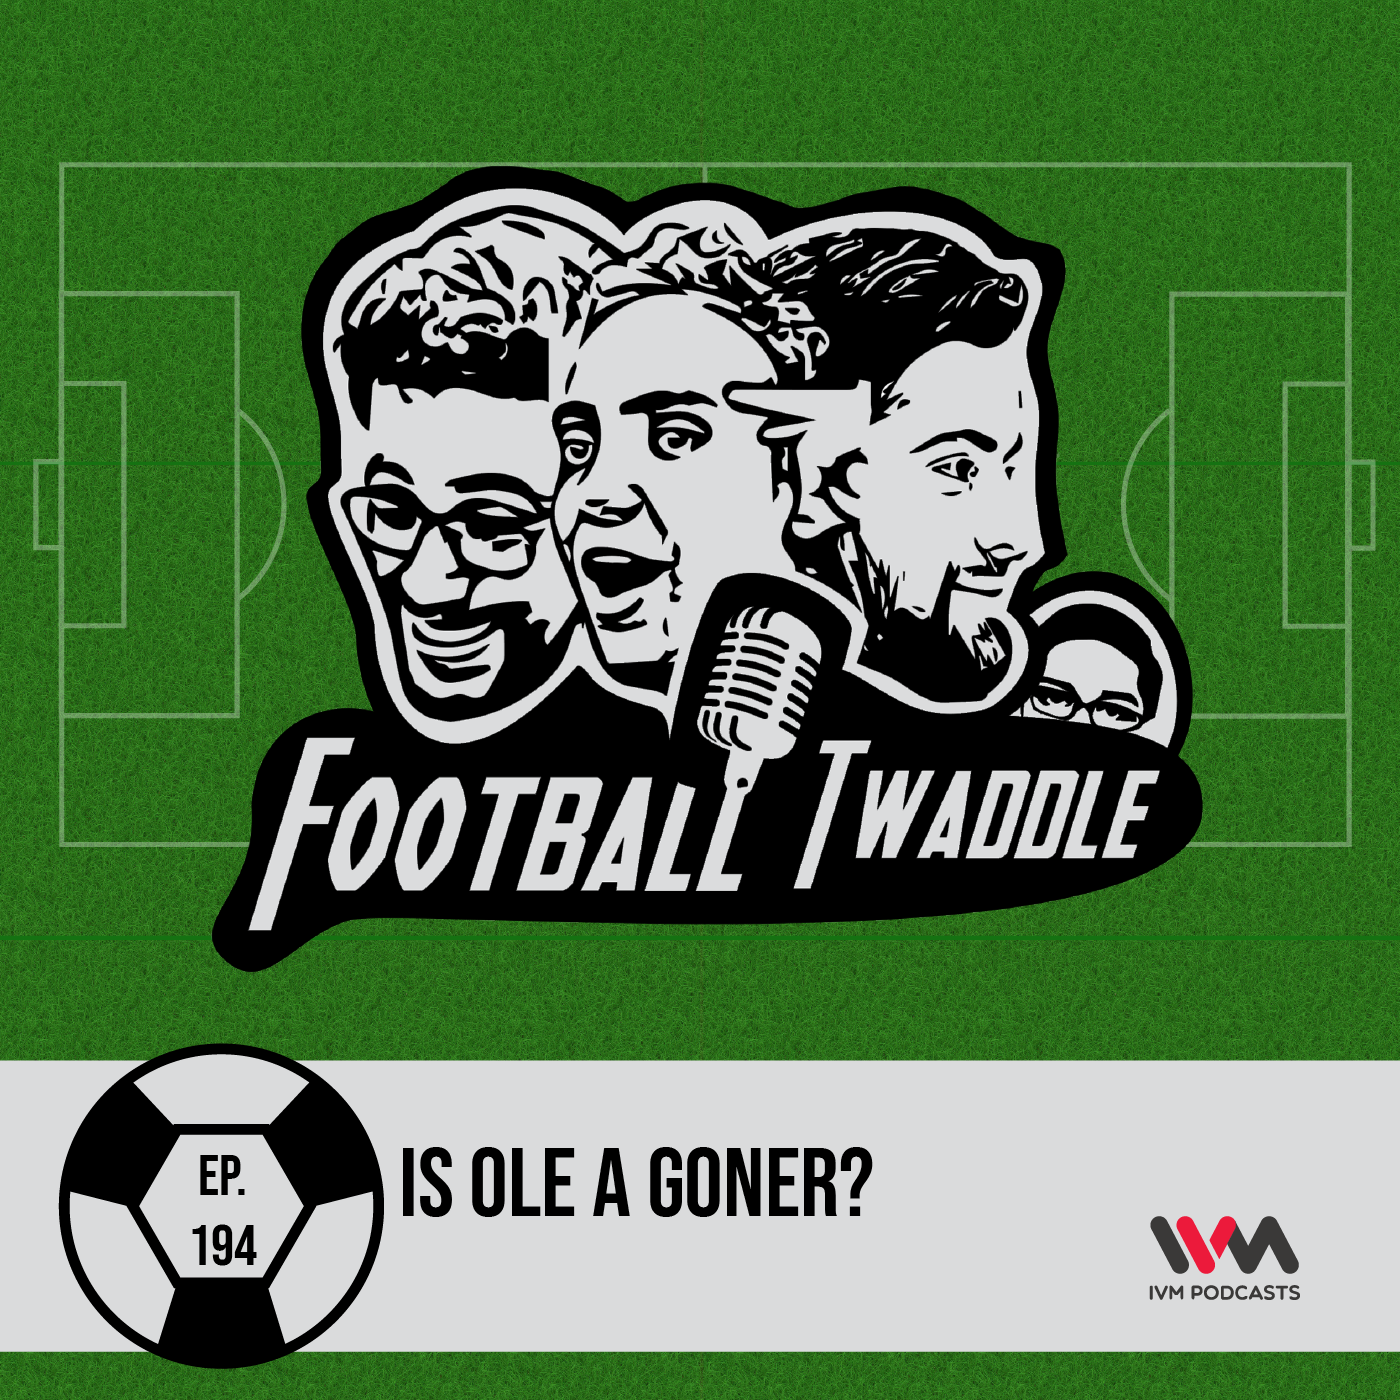 Is Ole a Goner?